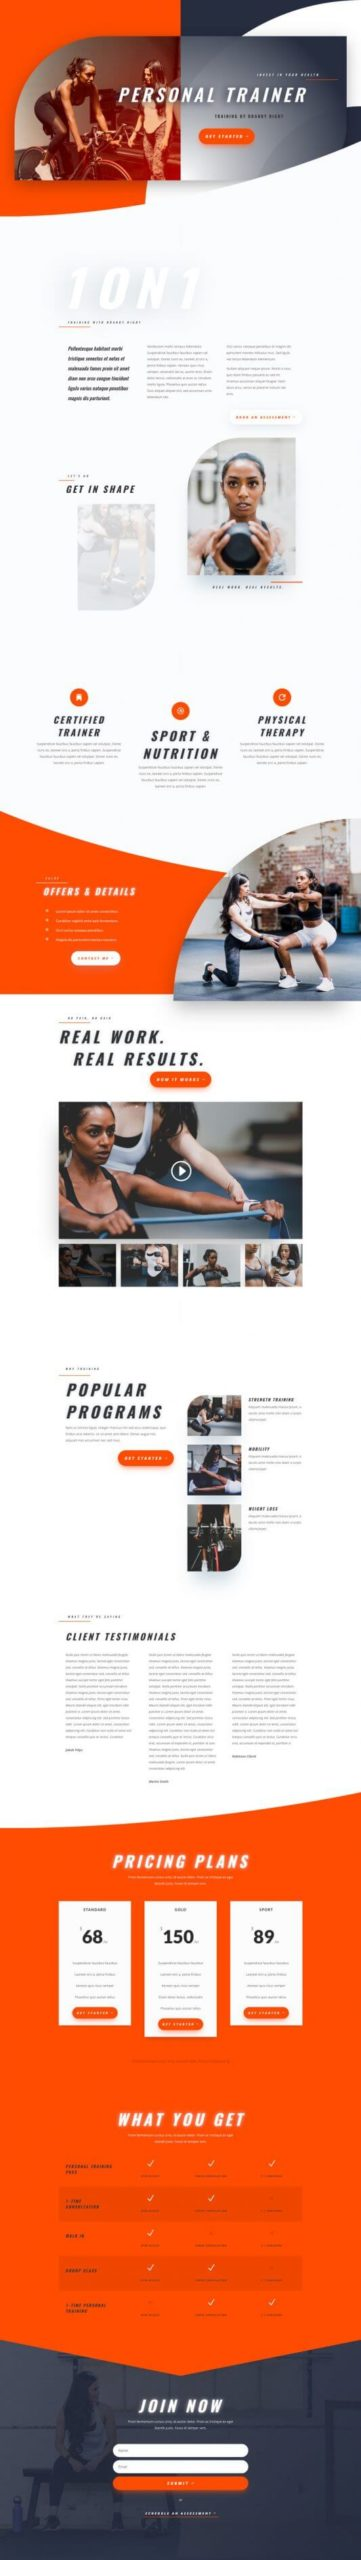 Plantilla WordPress para Personal Trainer